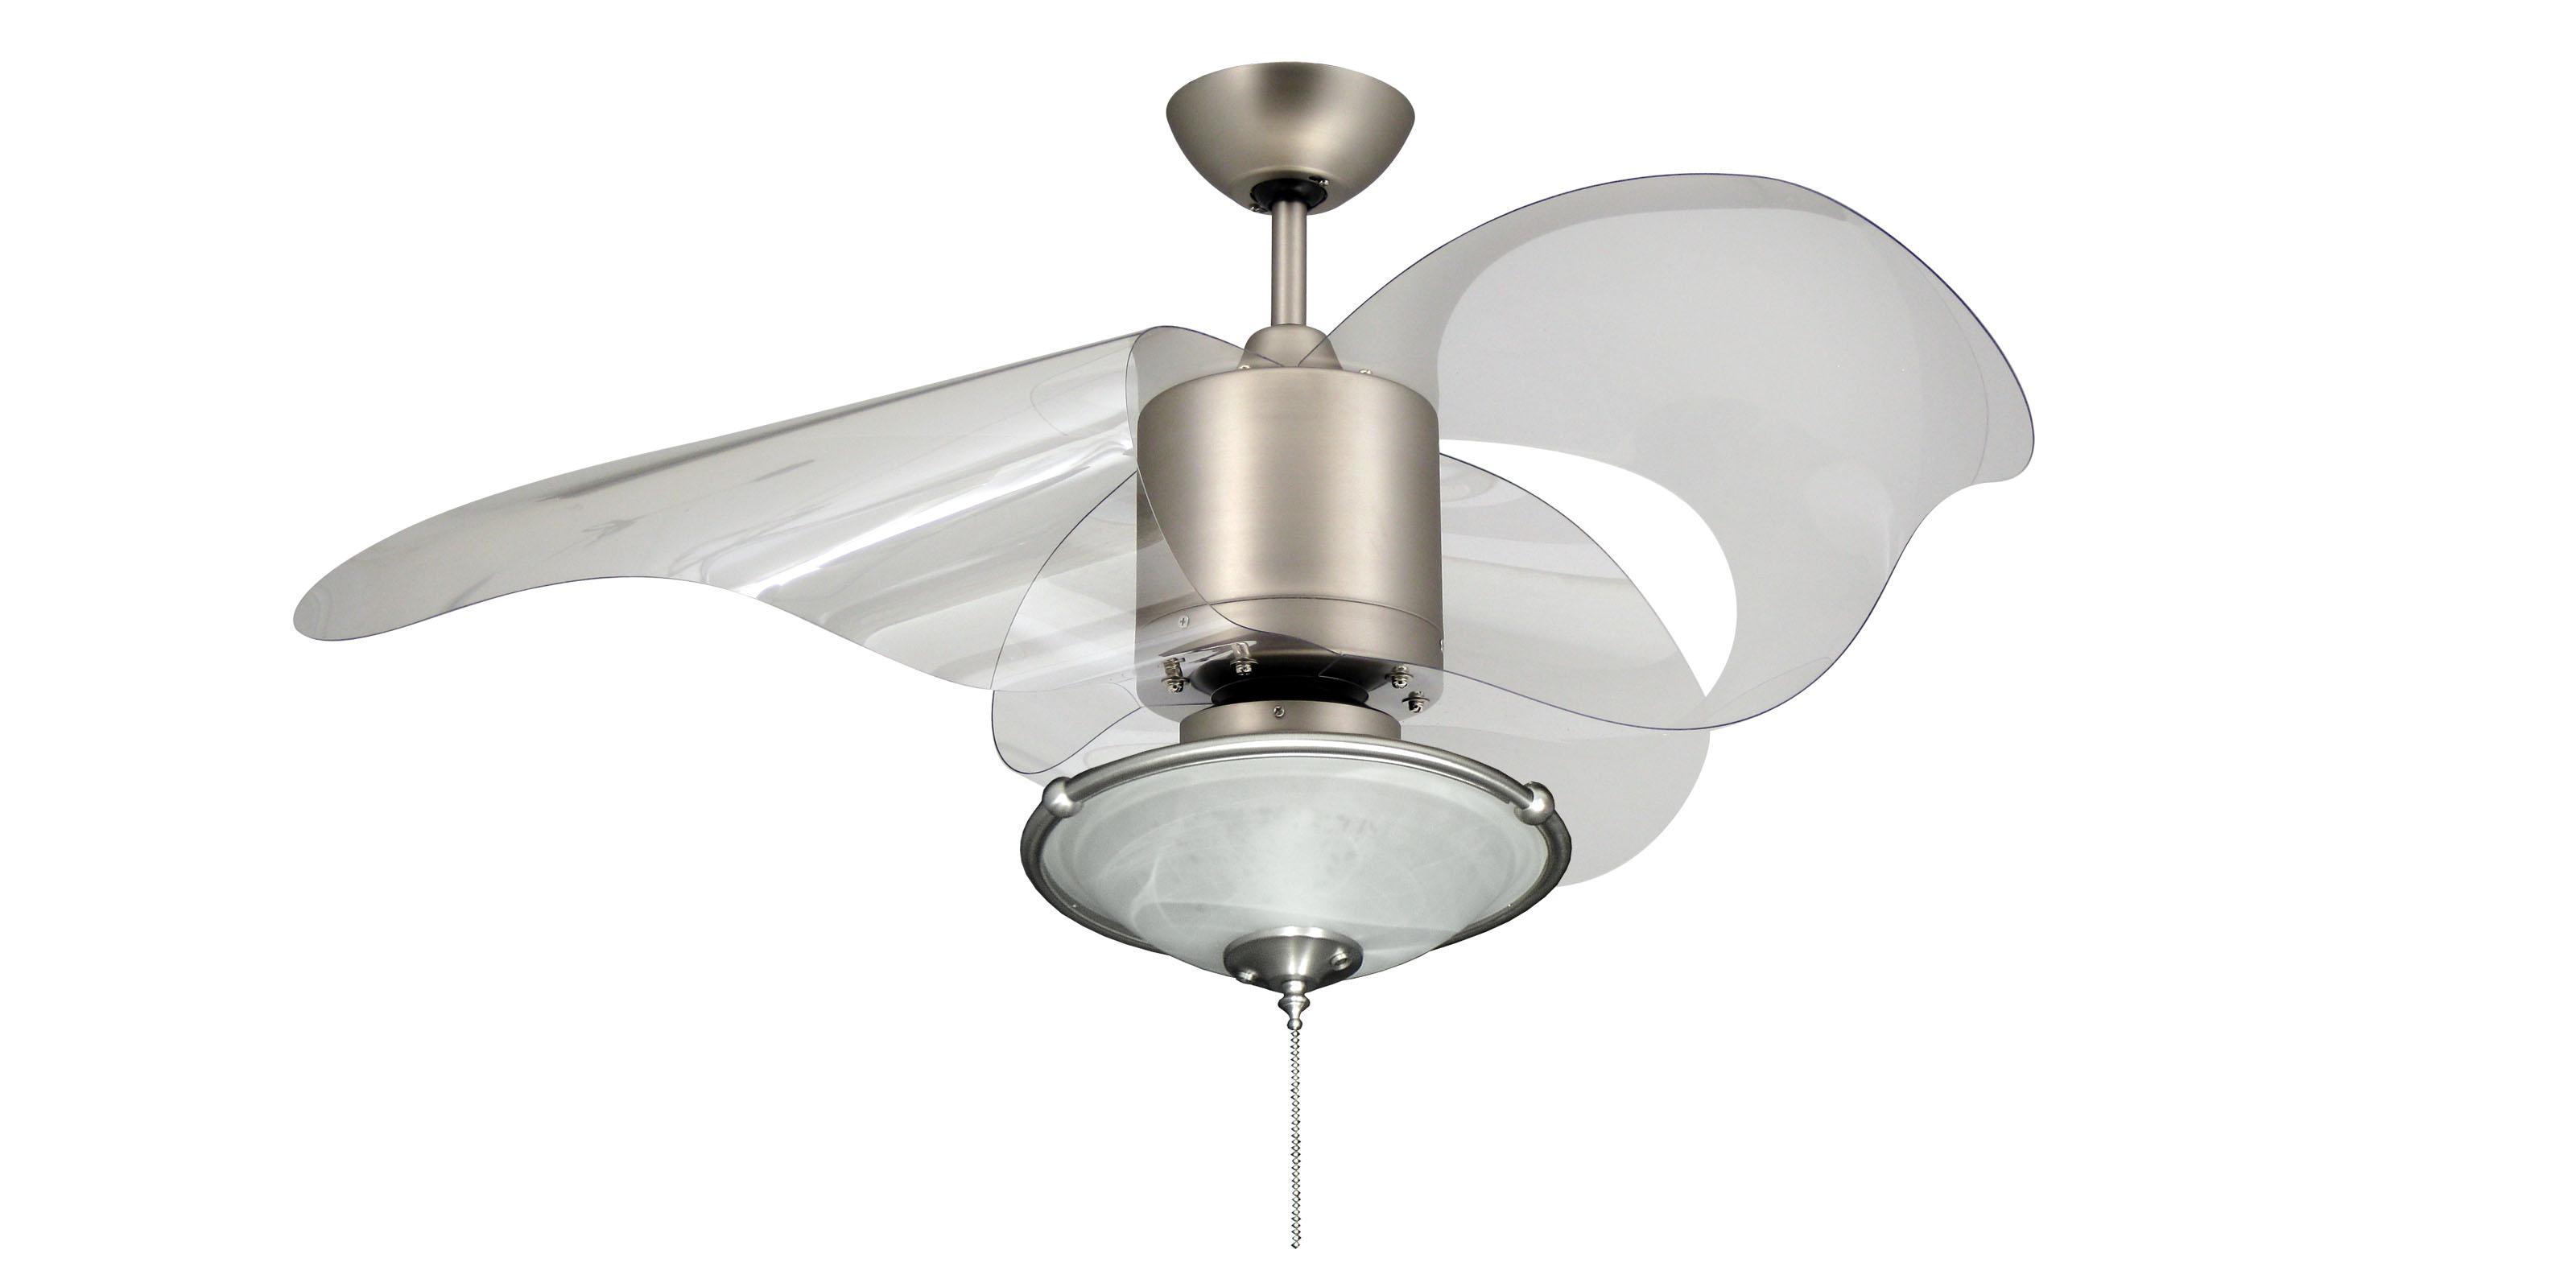 Fullsize Of Ceiling Fan Blades